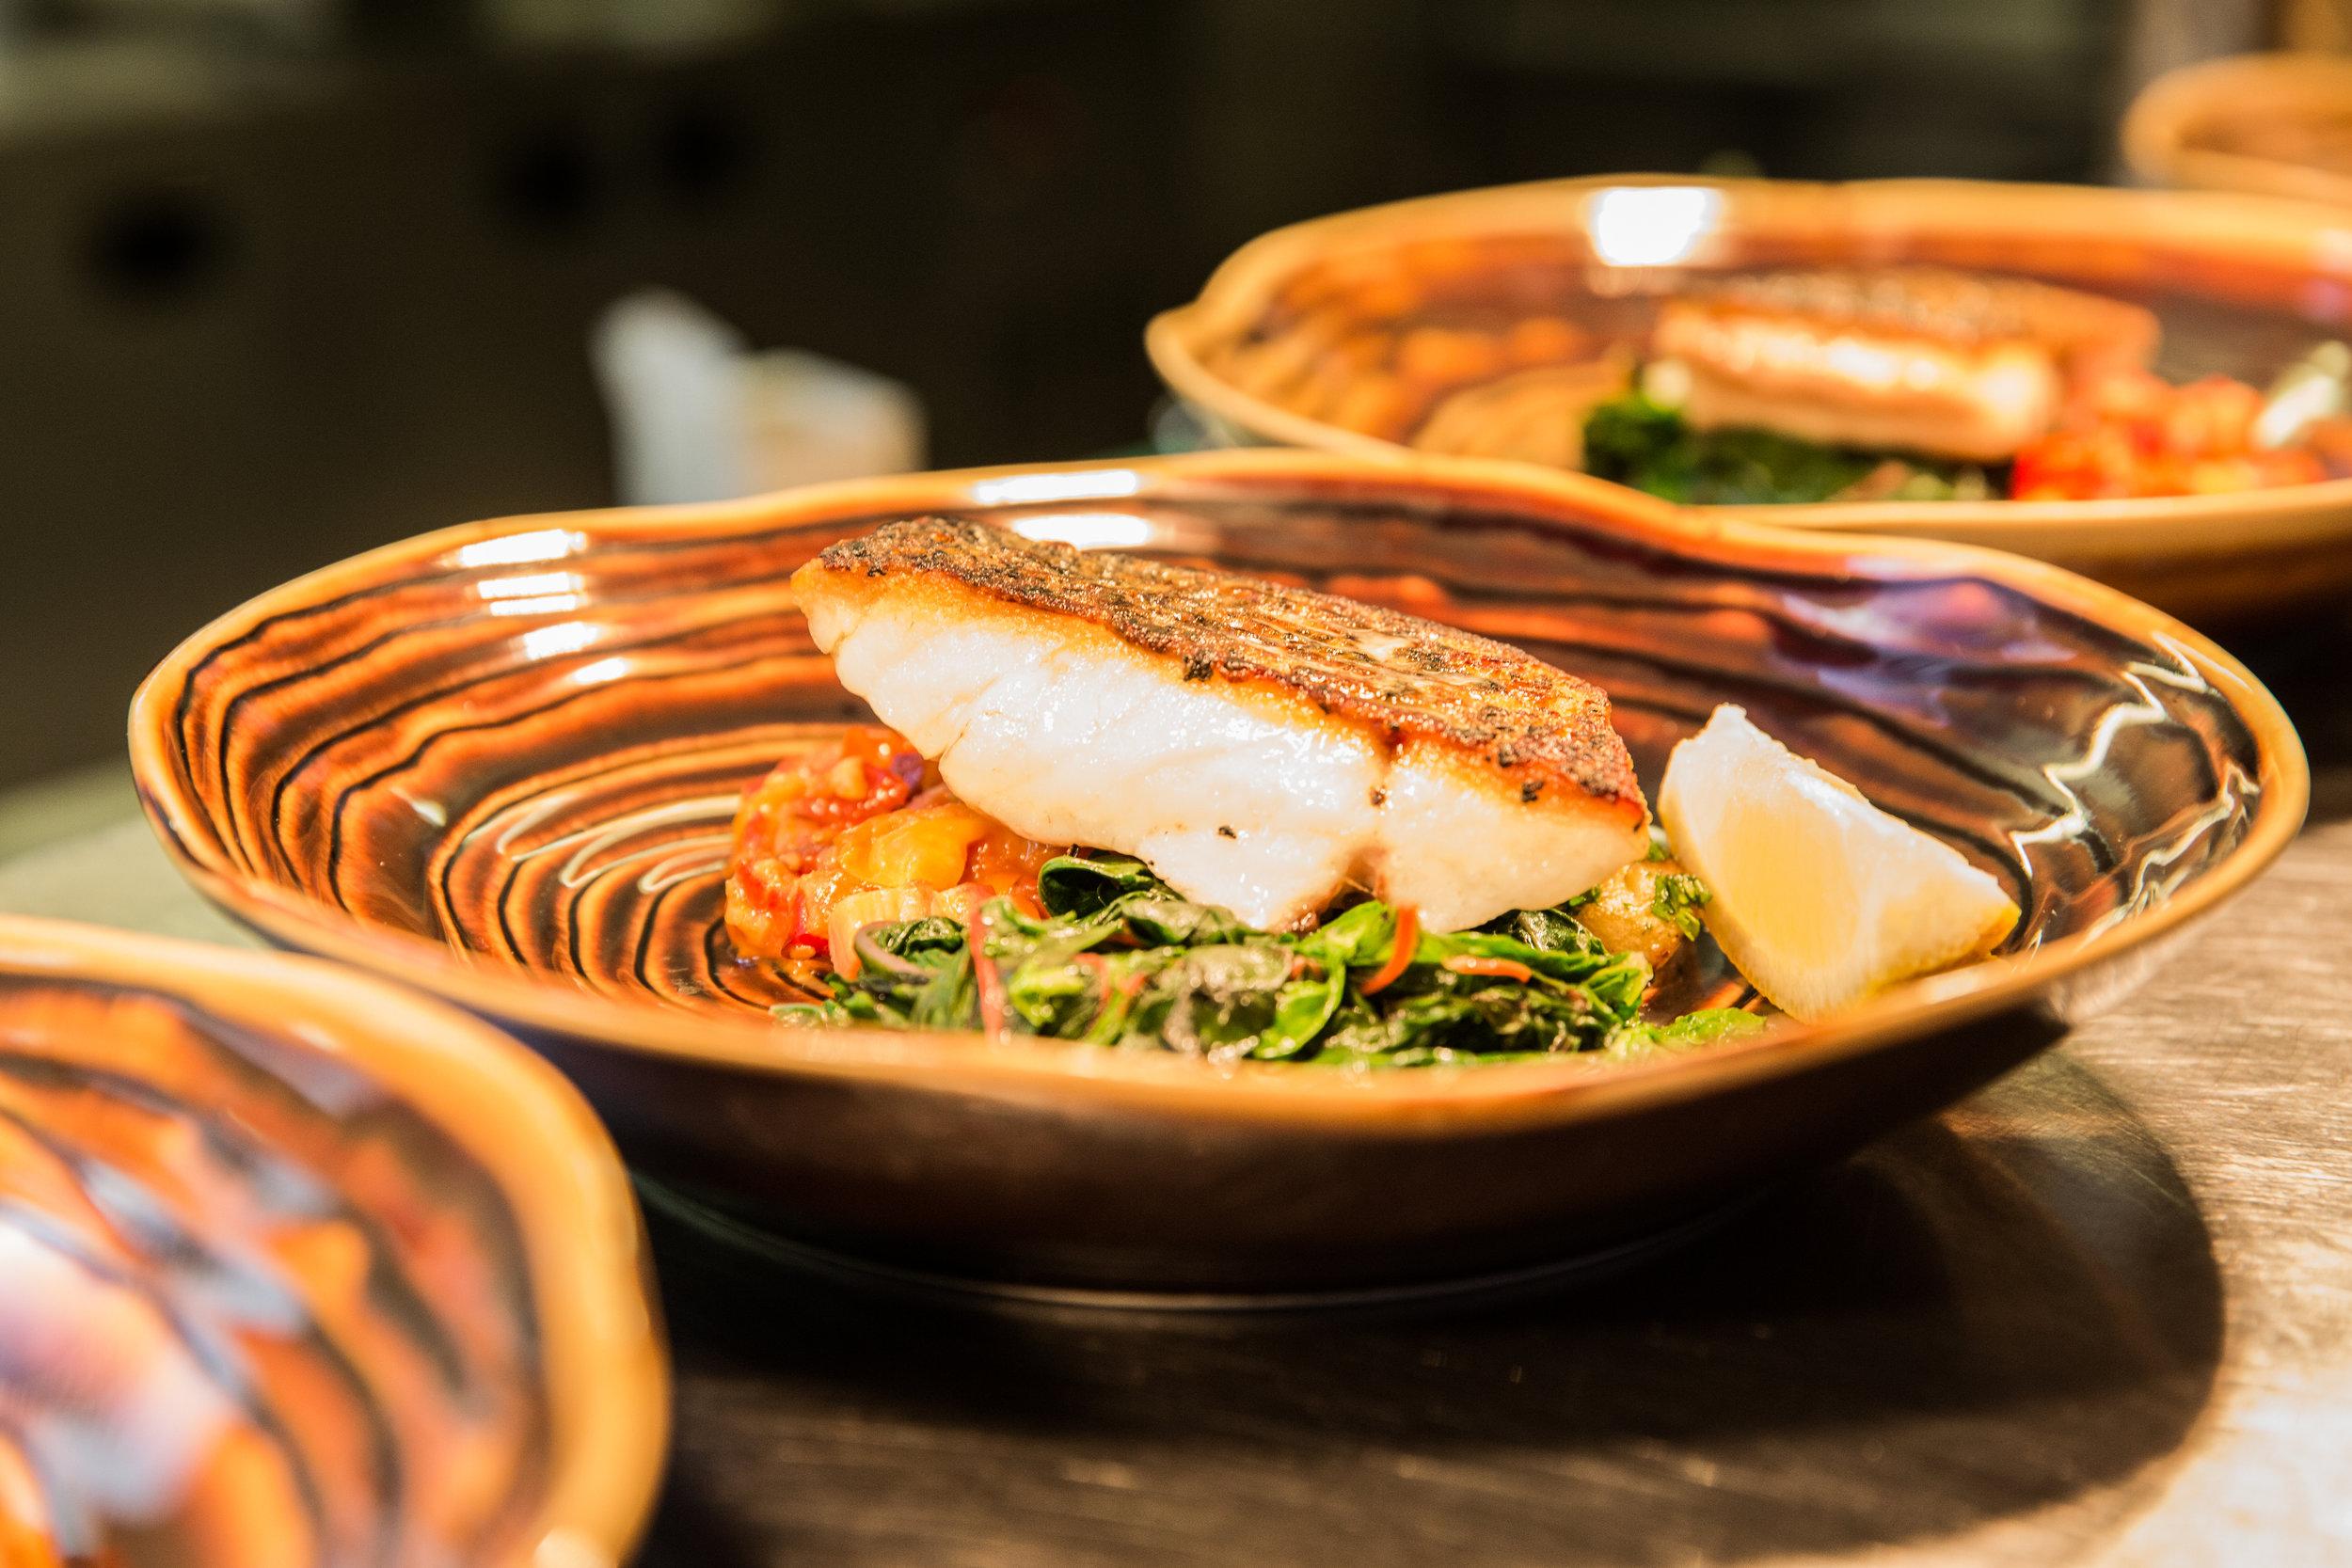 Food prepared at White Star Tavern Skills Workshop - Bass with roasted tomato stew.jpg